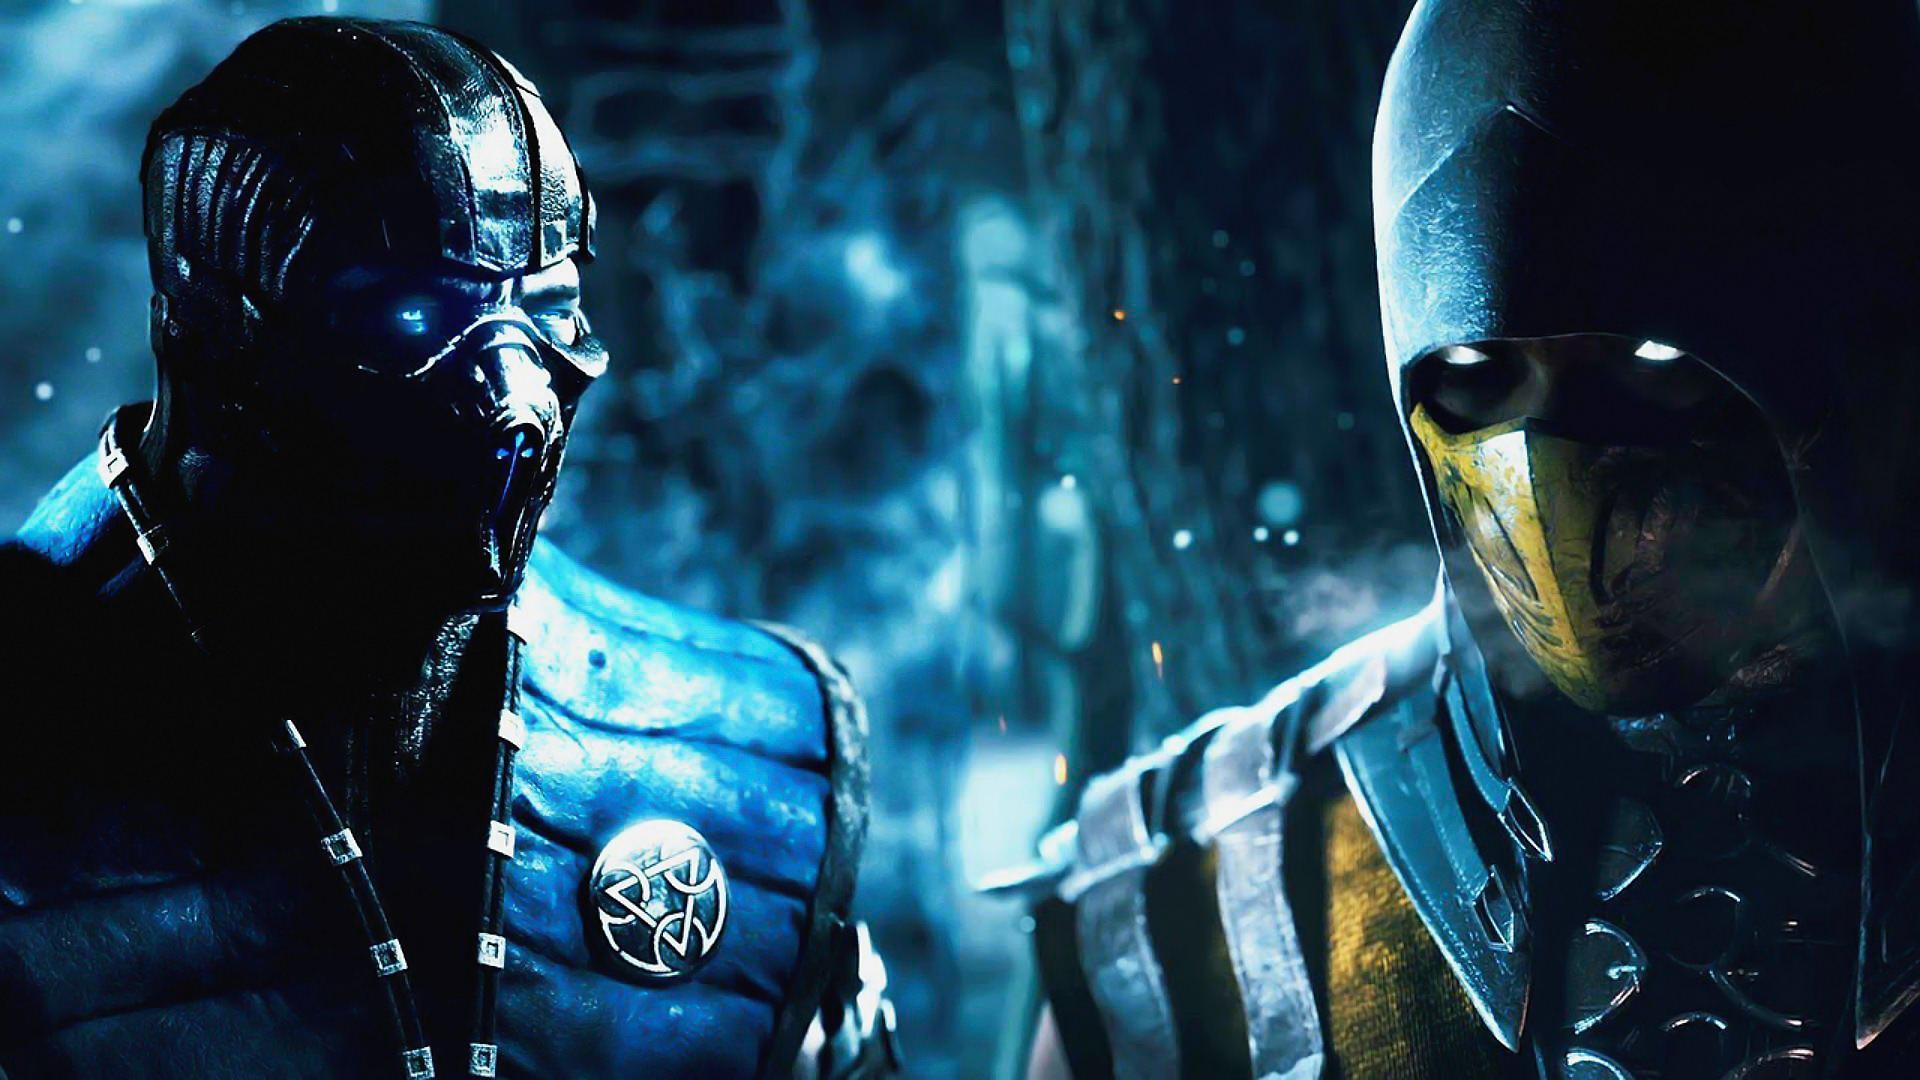 Mortal Kombat Scorpion Vs Sub Zero Wallpapers Top Free Mortal